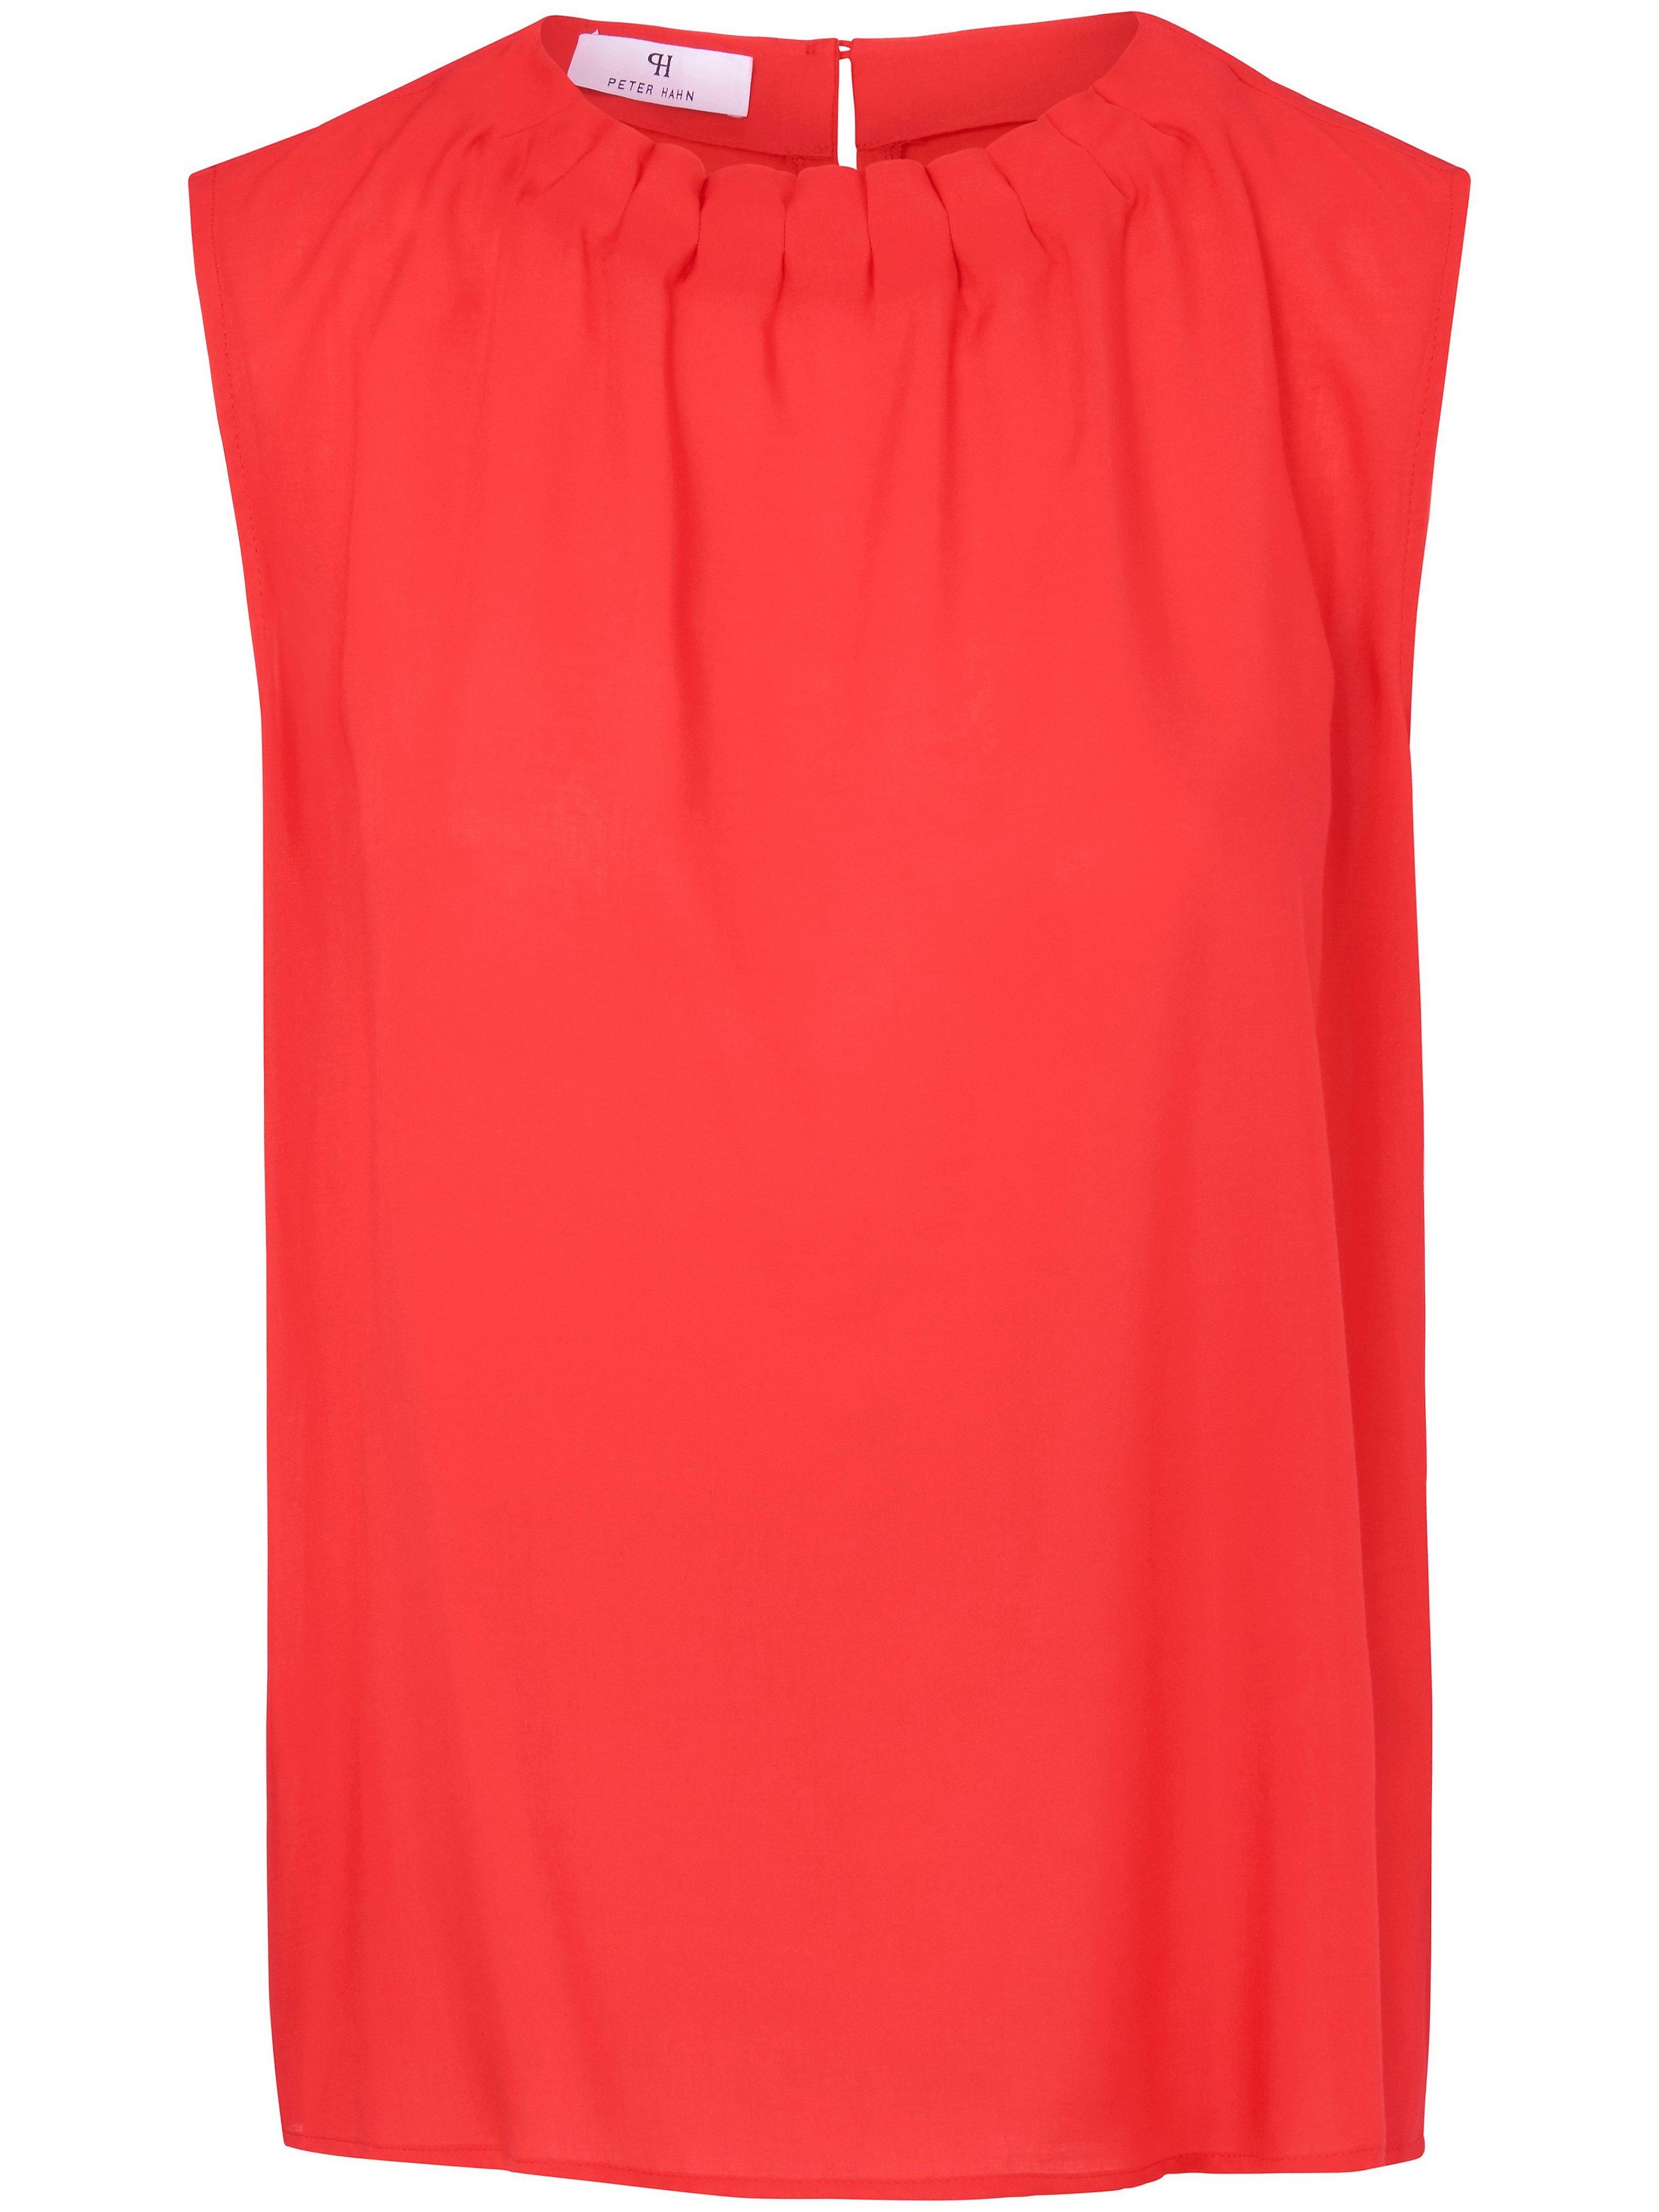 Mouwloos blouseshirt Van Peter Hahn rood